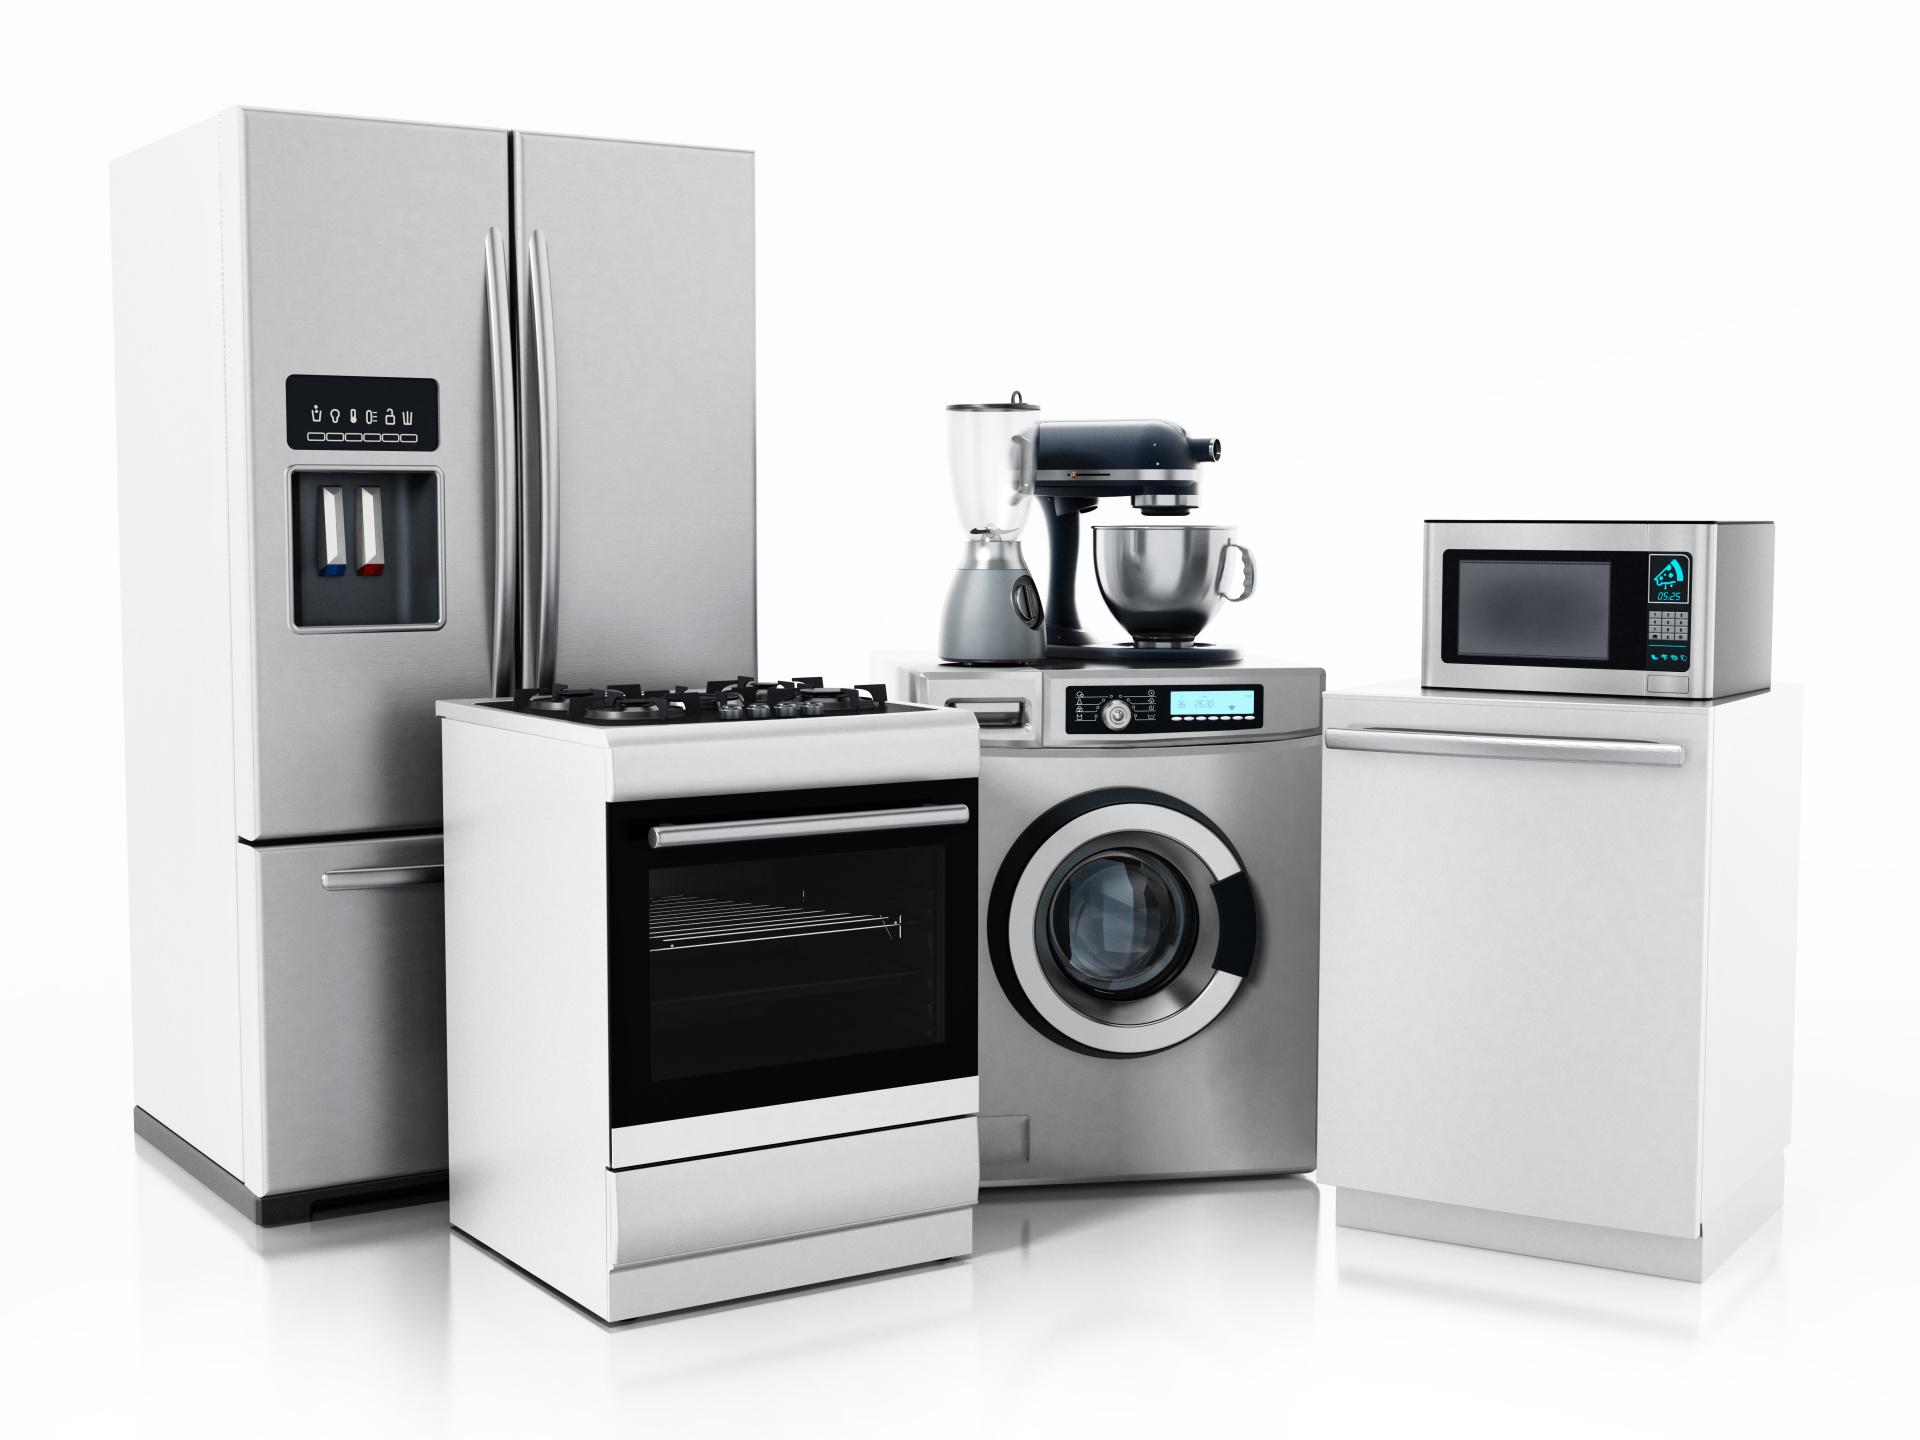 The Premier Authority In Kitchen Laundry Machine Repair Kalamazoo Folks Trust